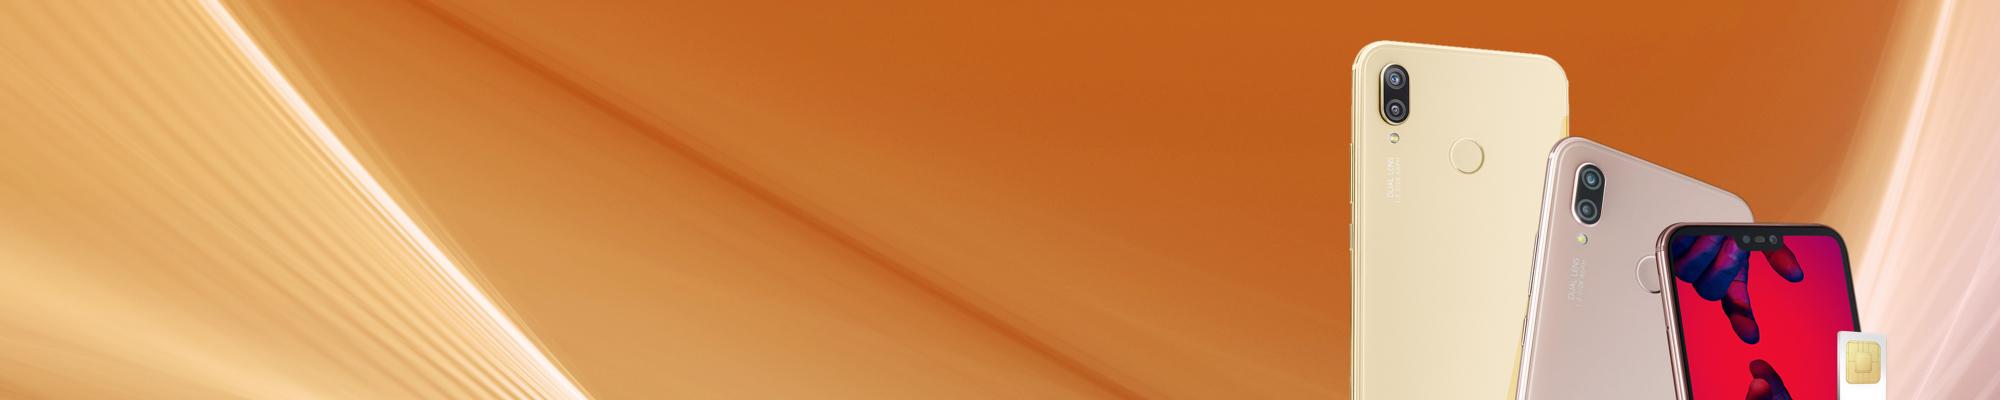 Mobilfunk_TV-Spot_Handyangebote_Landingpage_Buehne